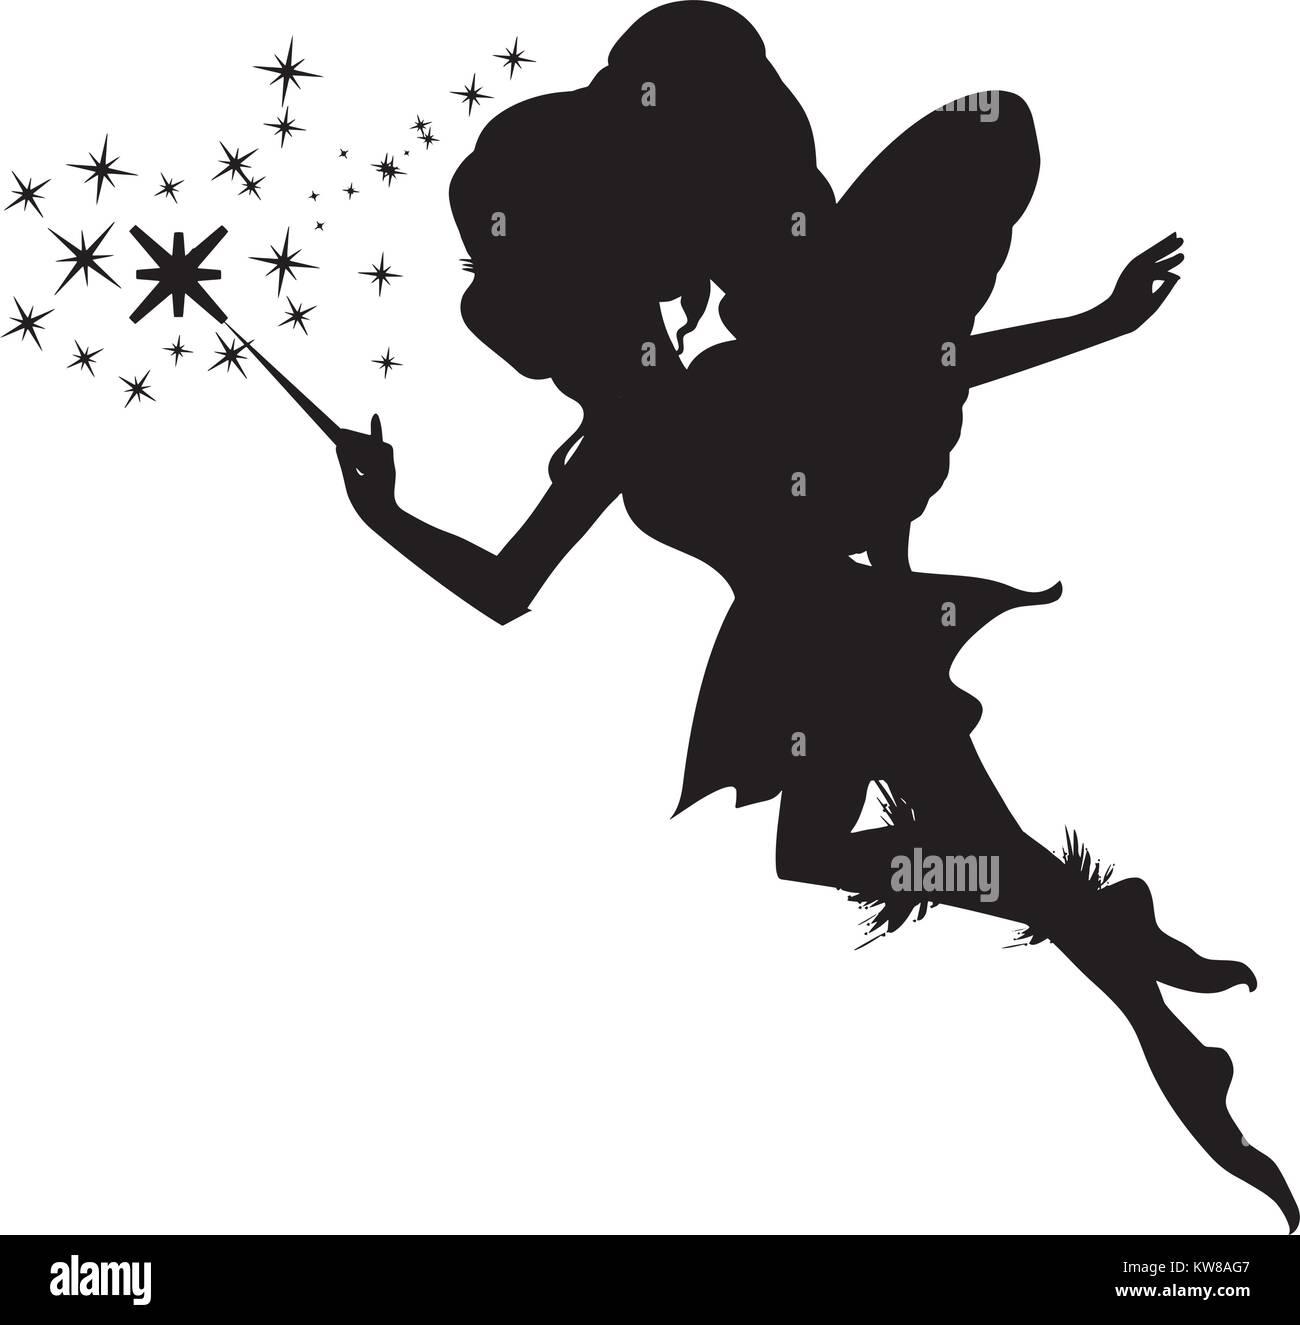 Fairy silhouette, Vector illustration - Stock Image